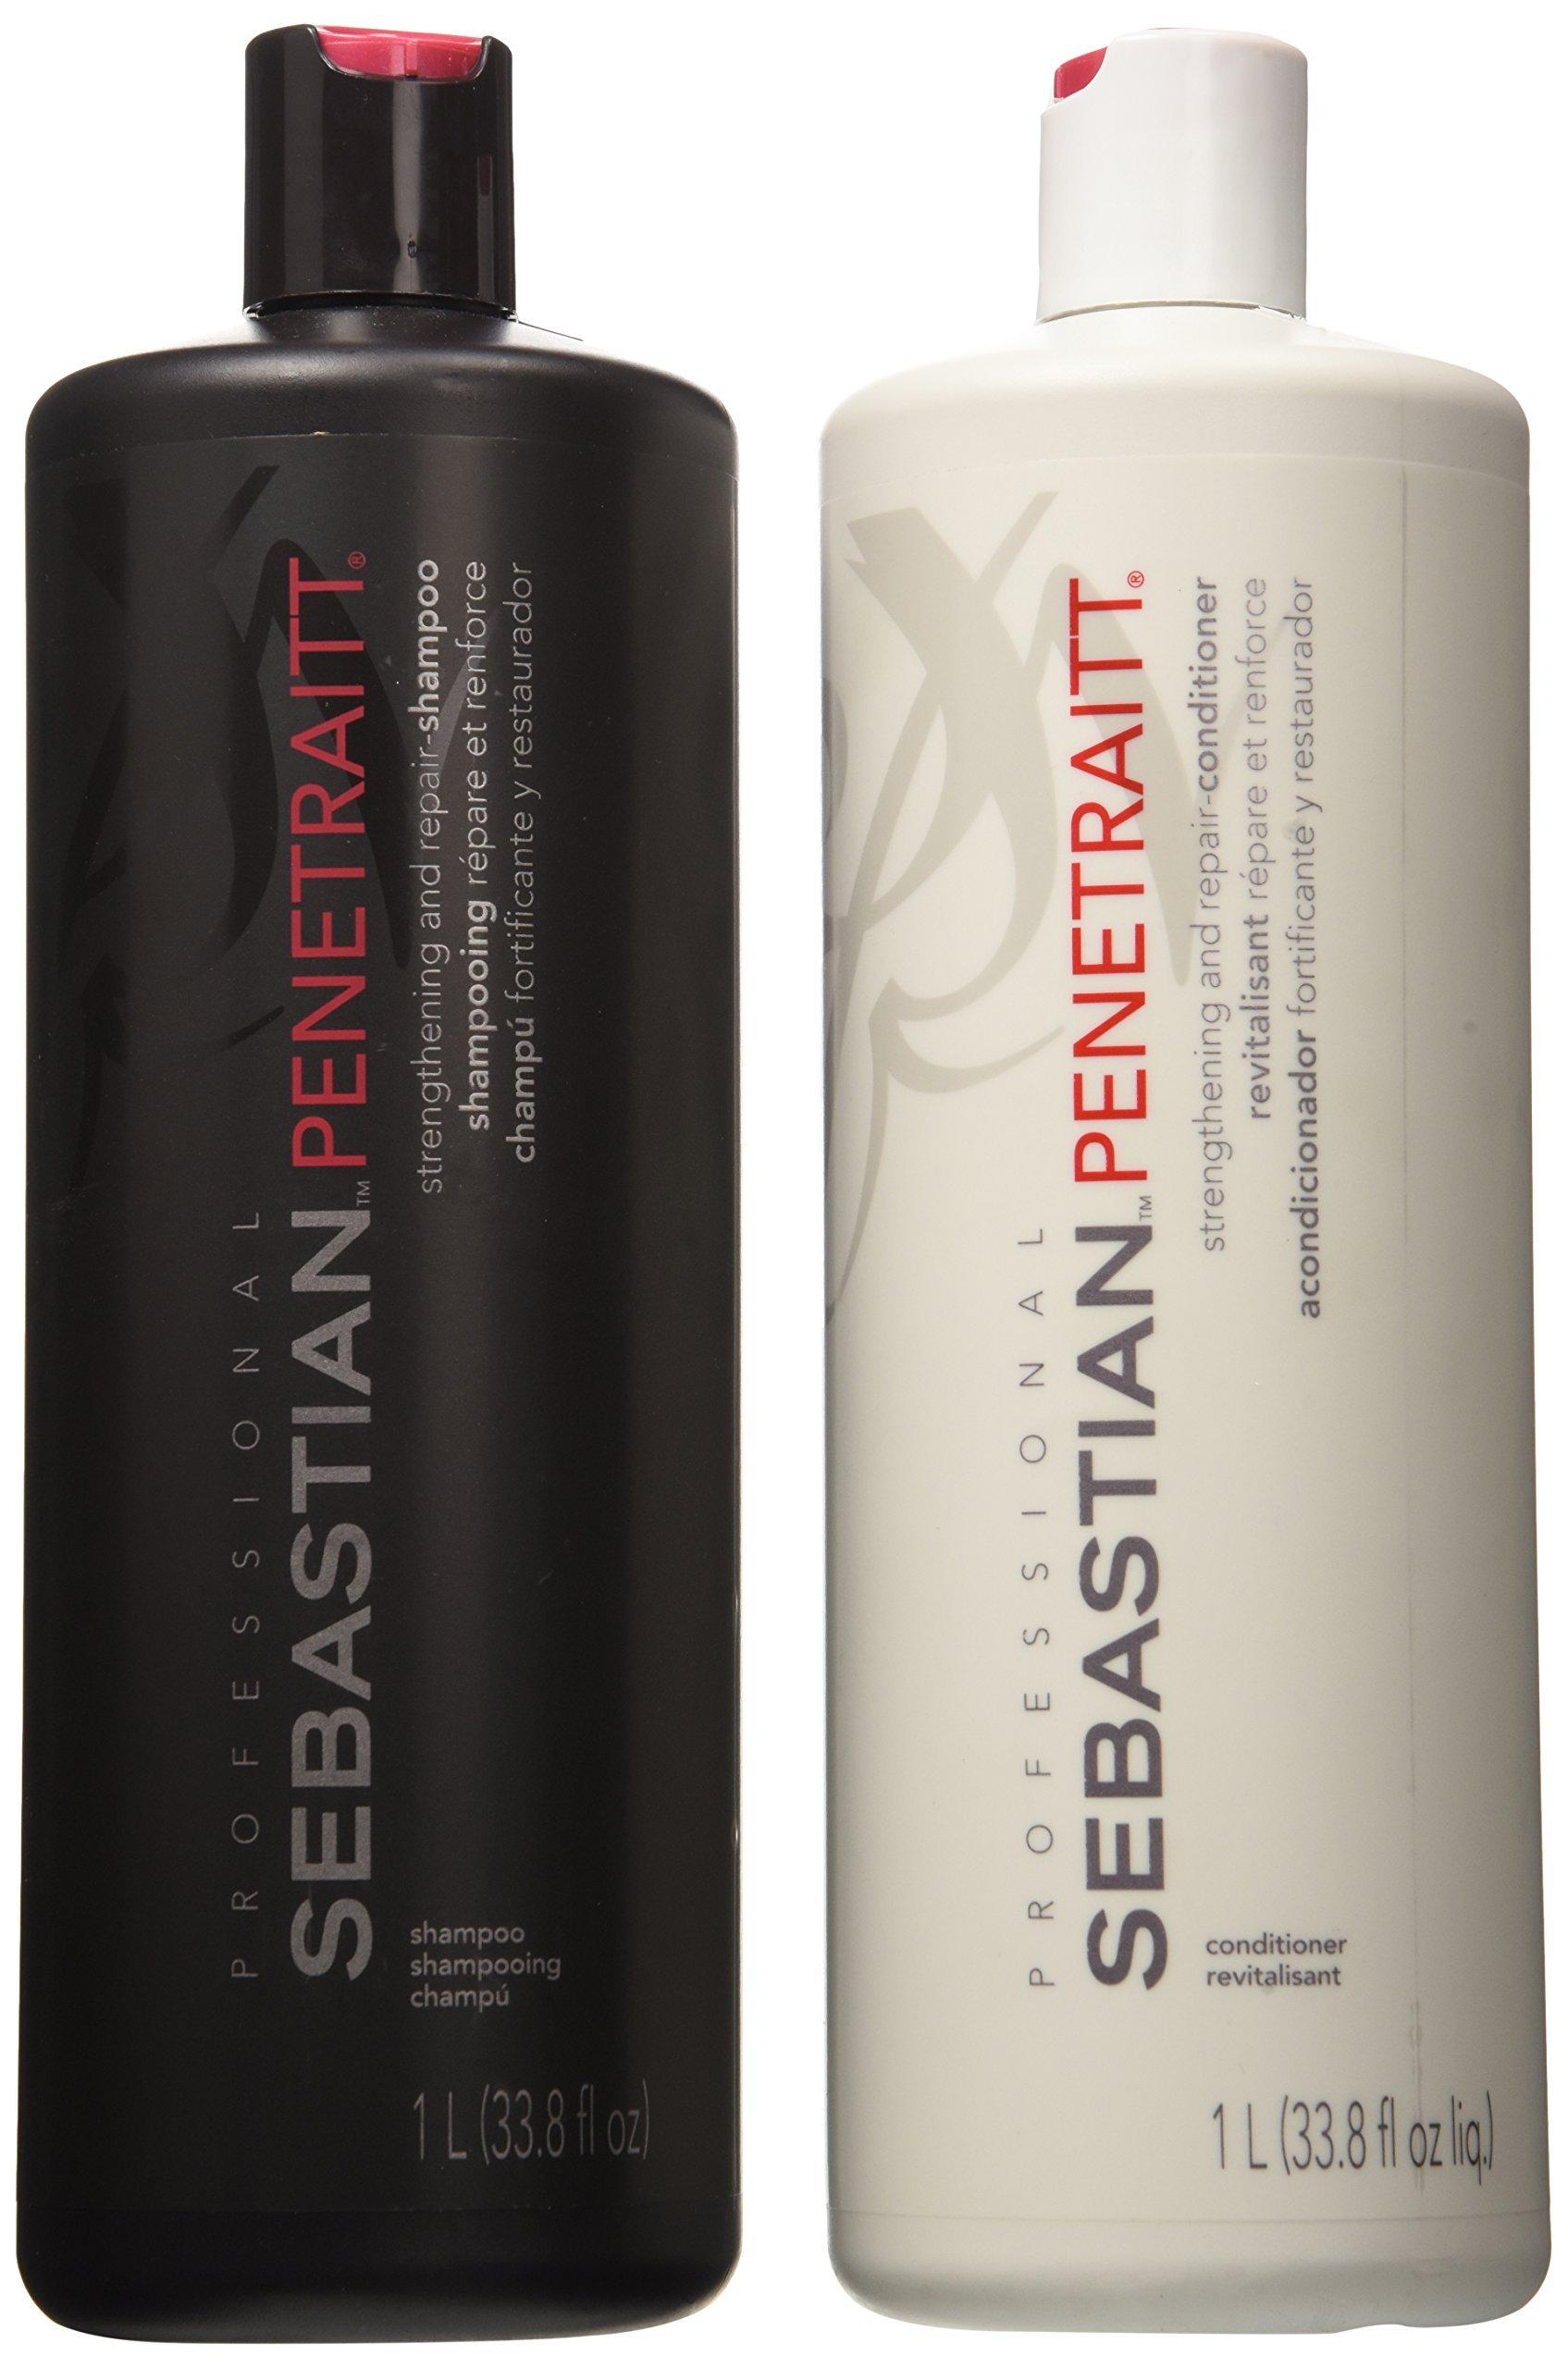 Pokupki/customer/account/login - Sebastian Penetraitt Strengthening And Repair Shampoo Conditioner Liter Set